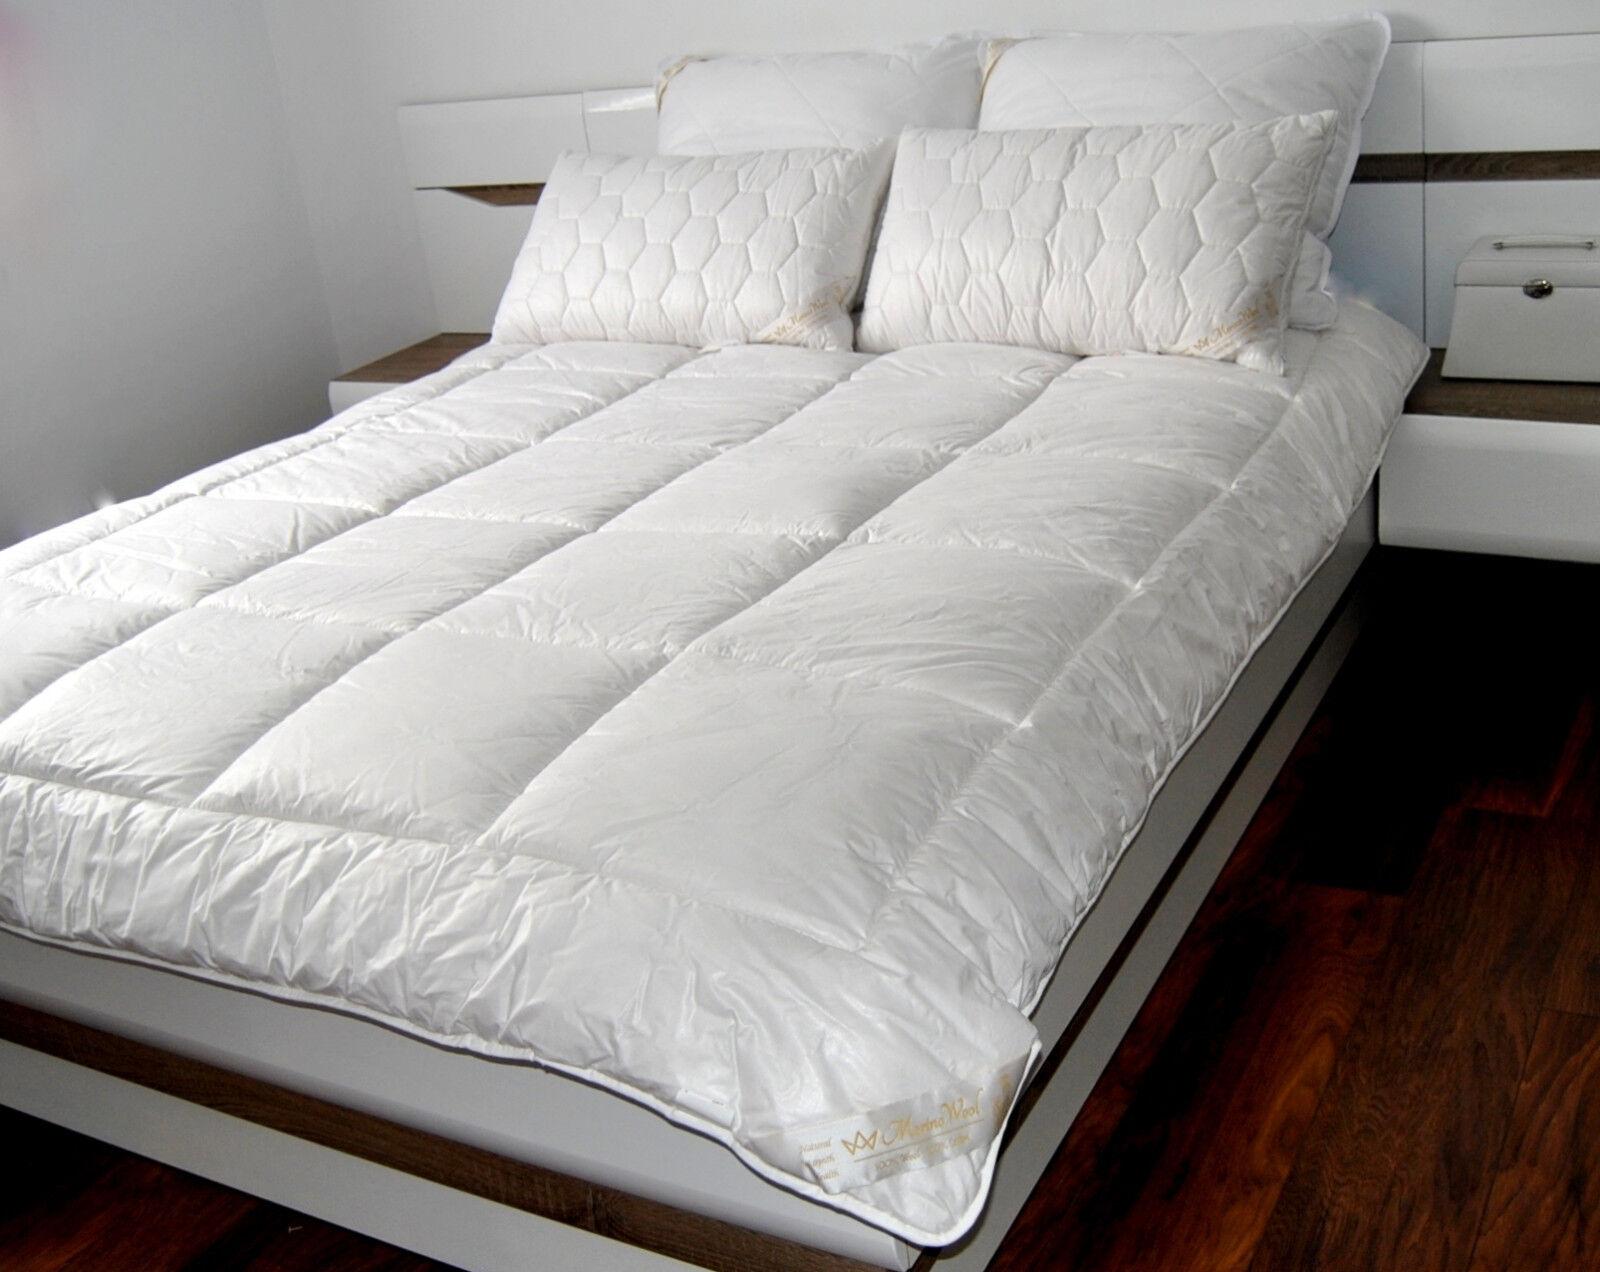 Merino Wool Quilt Cotton medium 10.5tog 500gsm King DUVET 220x230cm + 2 pillow